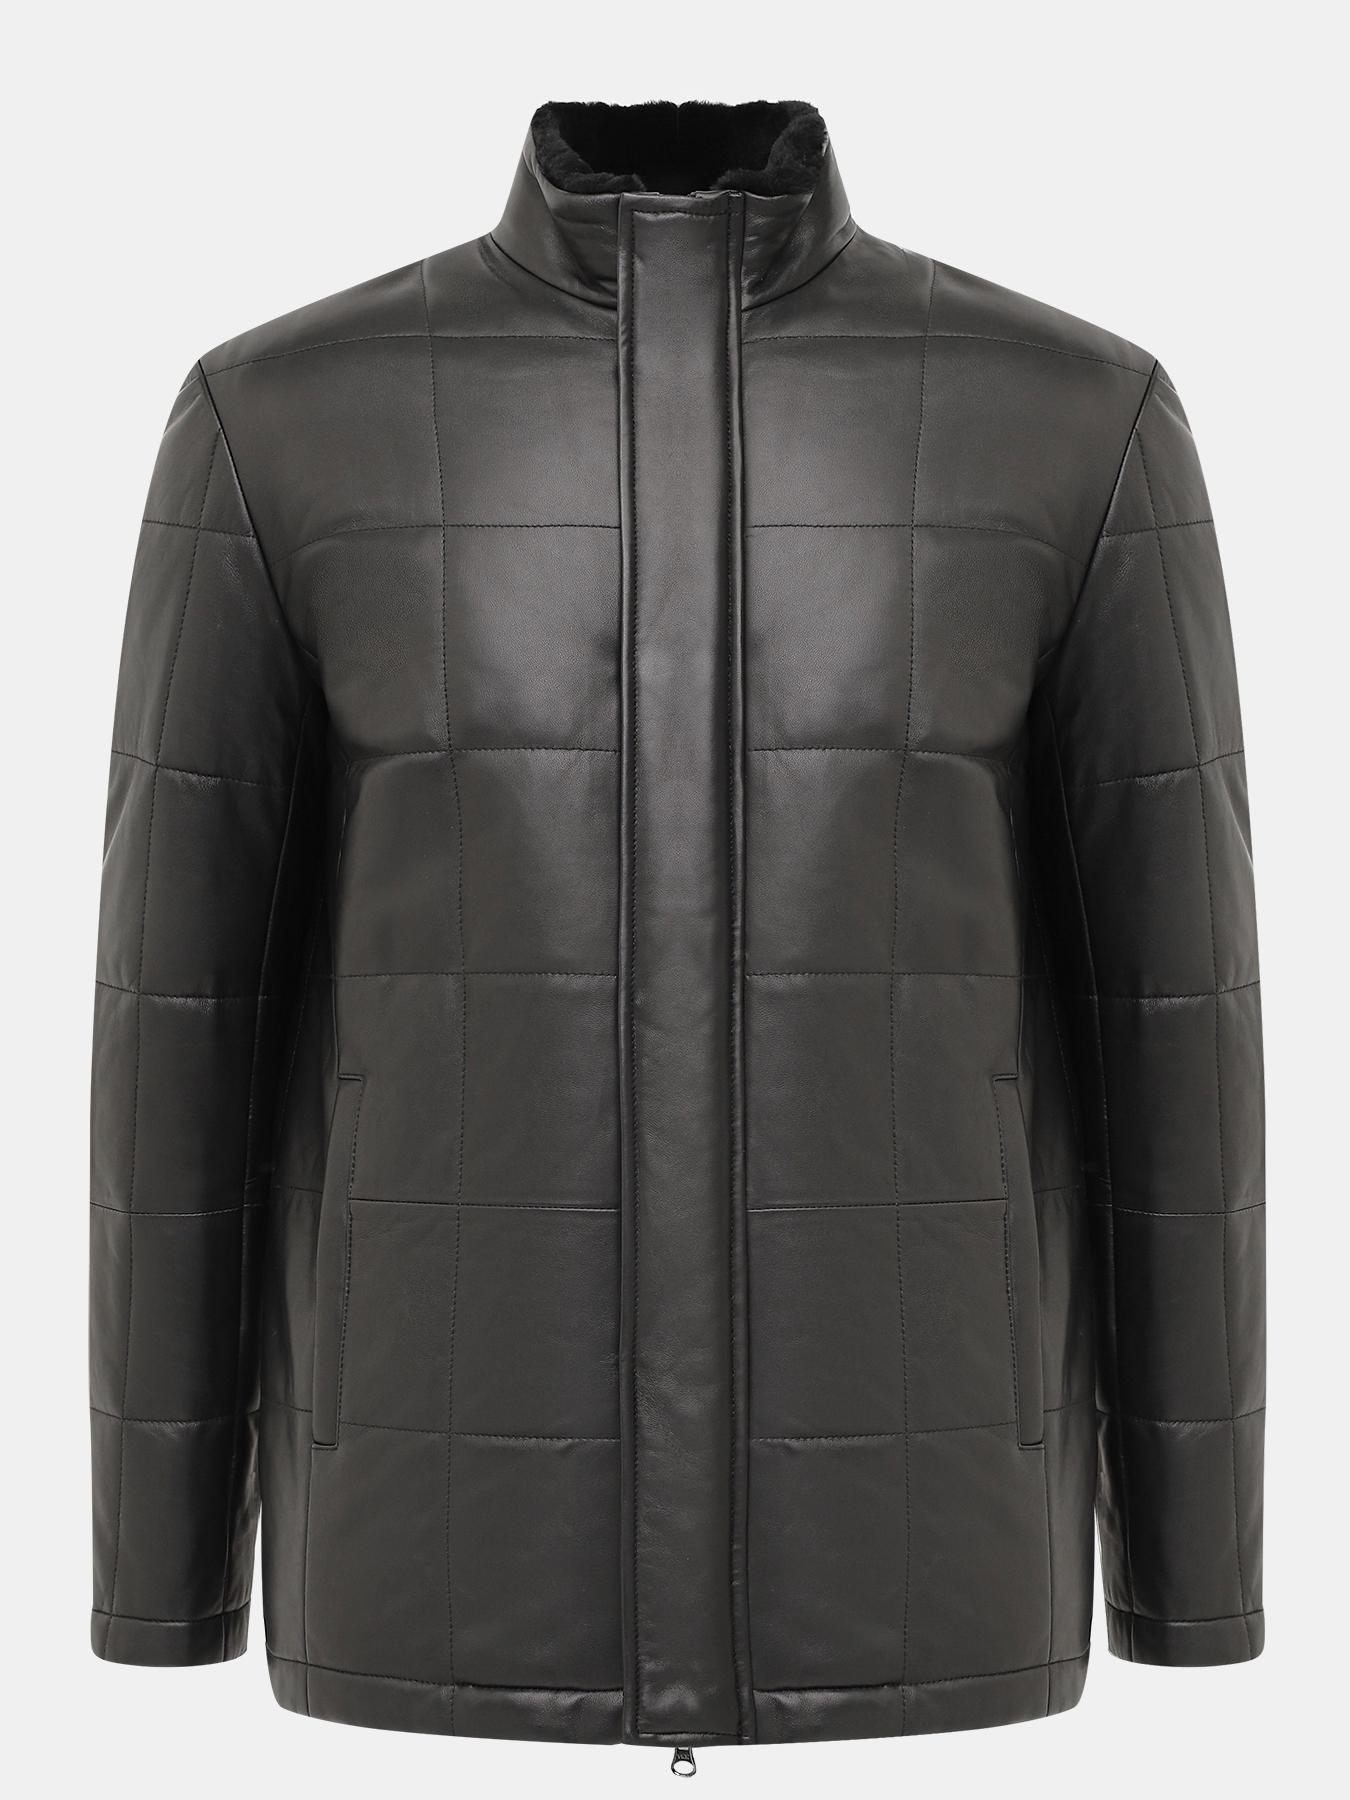 Кожаные куртки Alessandro Manzoni Кожаная куртка